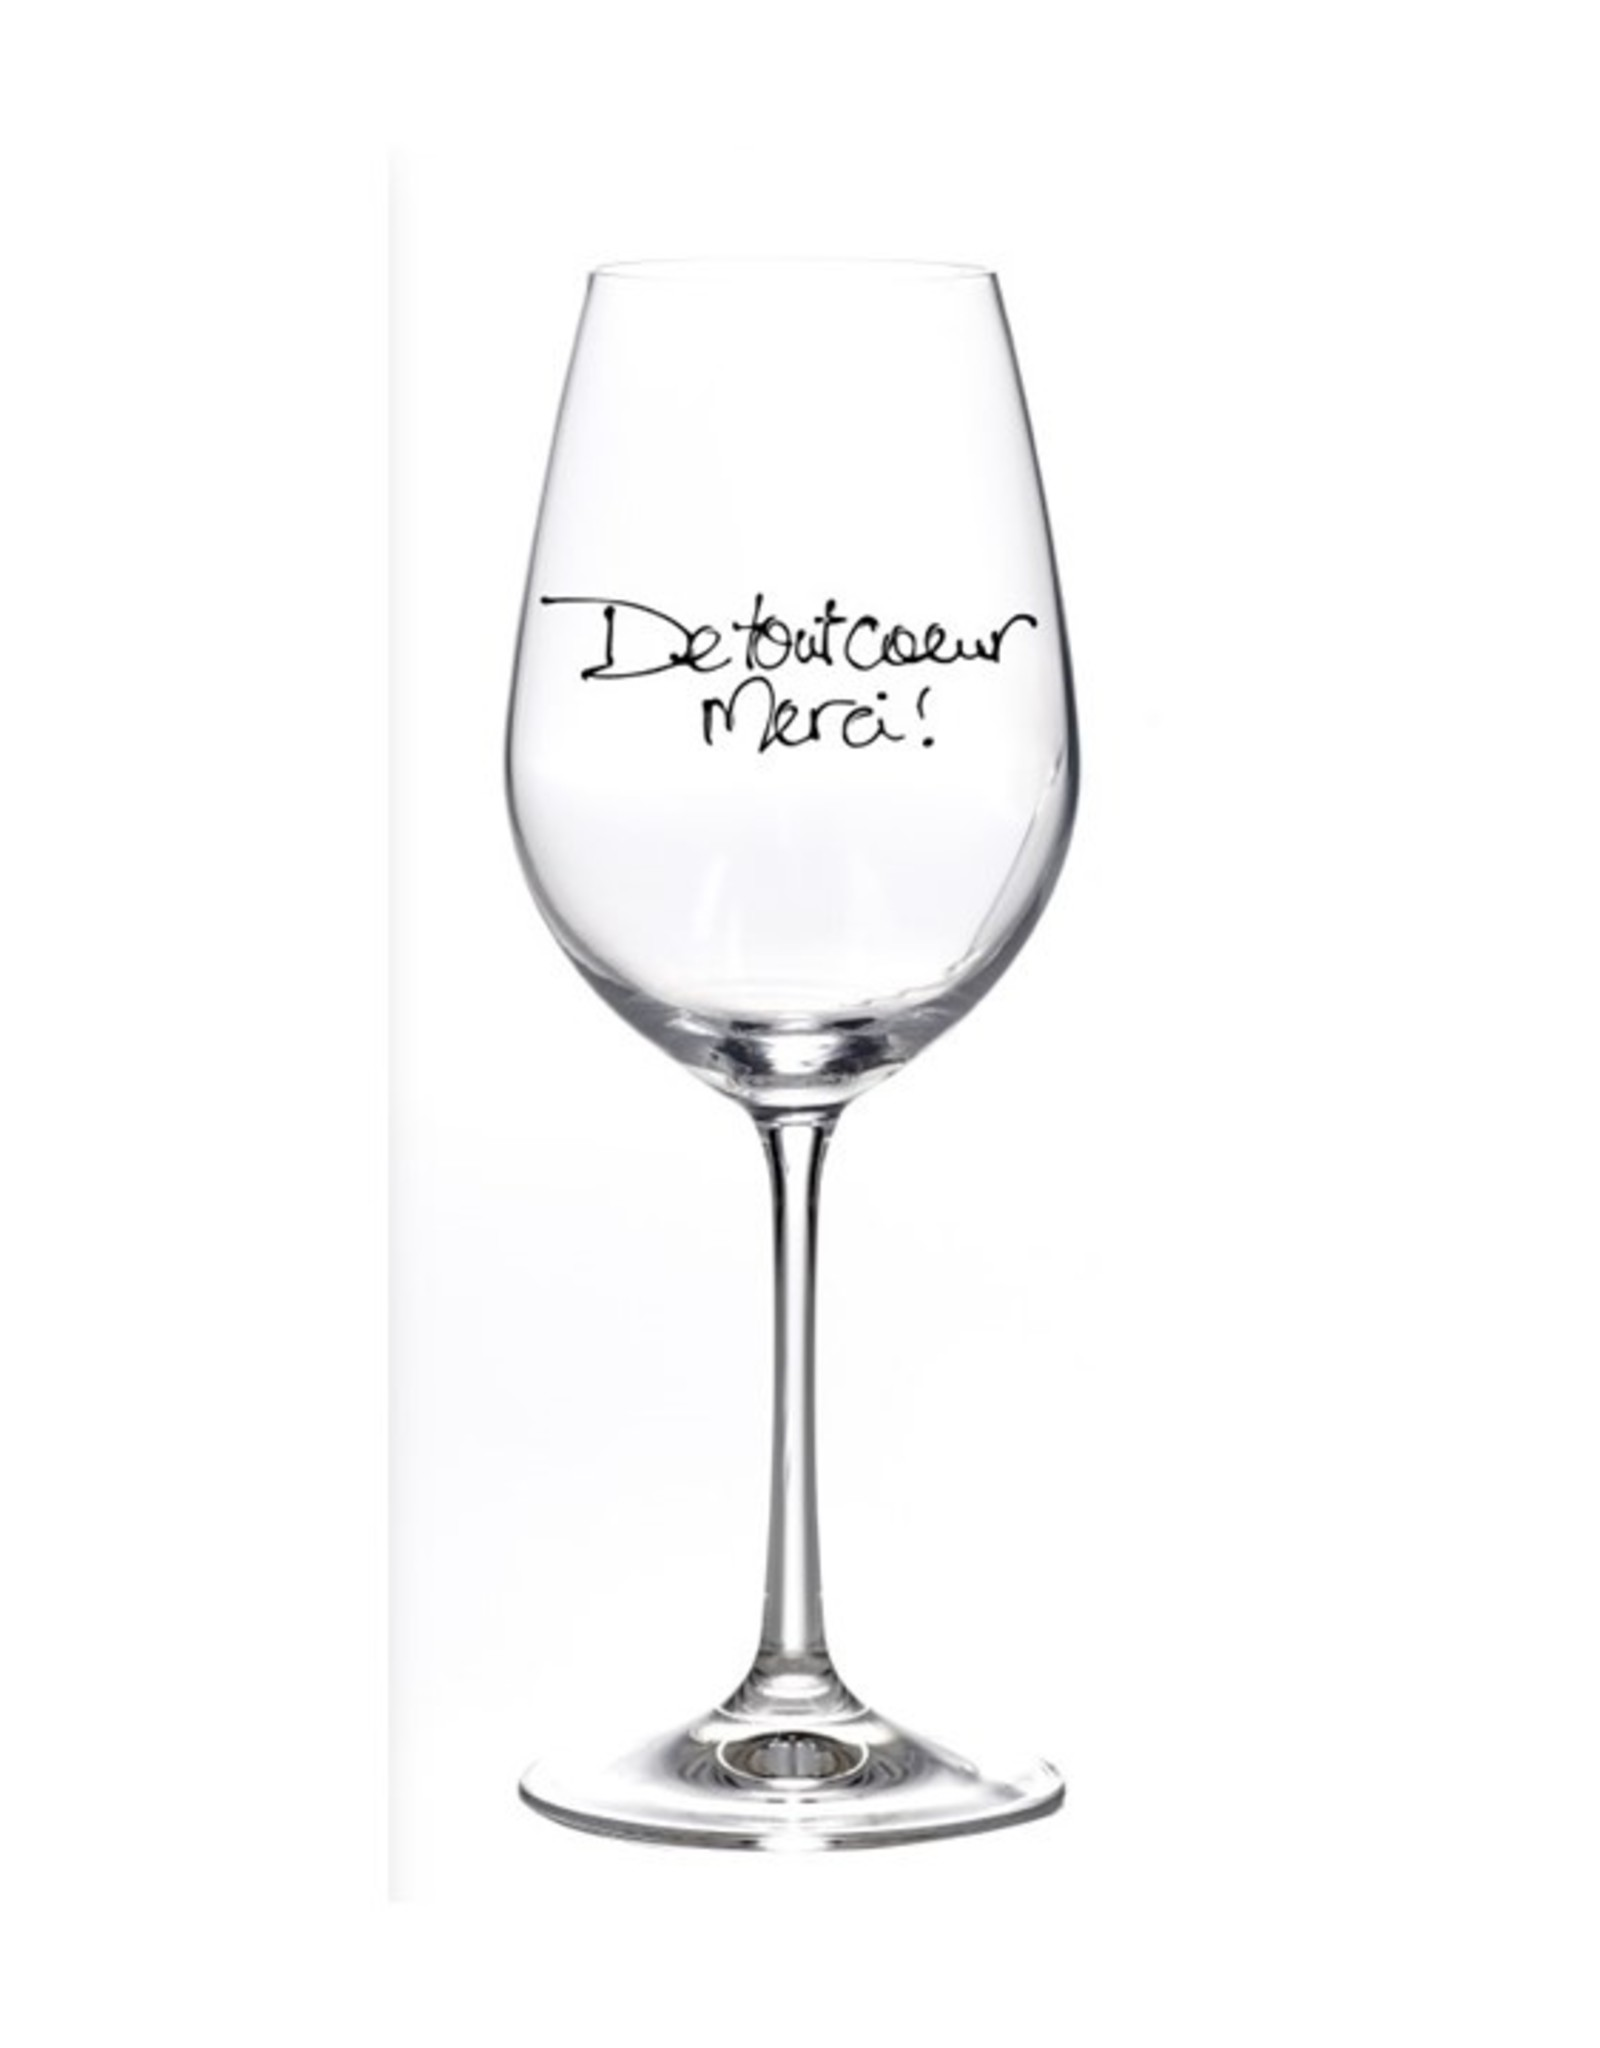 Bizzart & cie Verre à vin  robe Rouge   - Merci